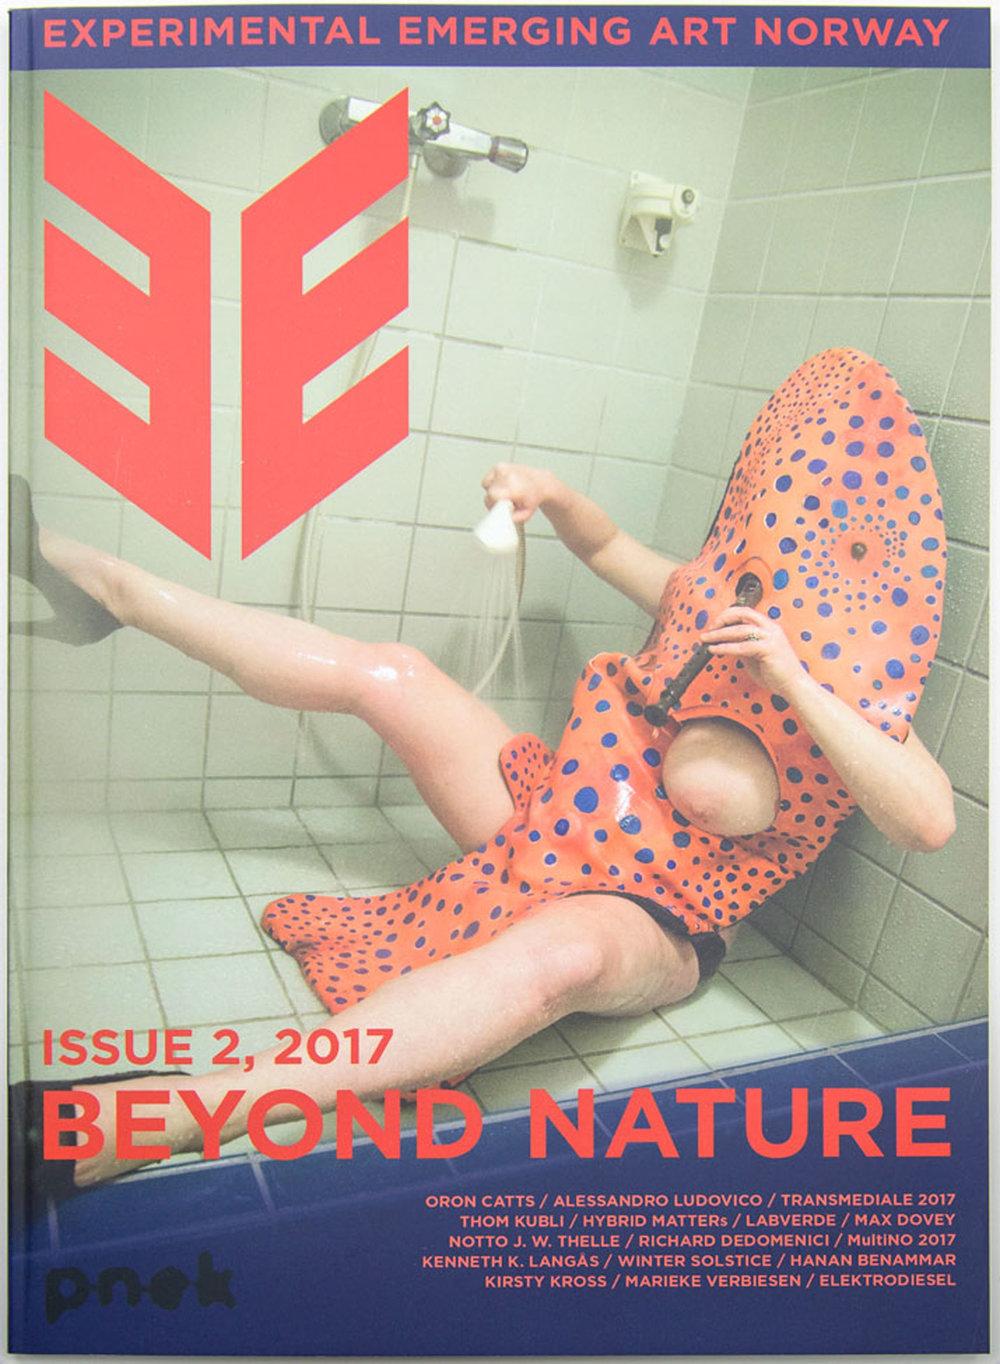 EE Experimental Emerging Art #2 : Beyond Nature  Stahl Stenslie, Zane Cerpina (eds.). PNEK, 2017. ISSN: 2464-448X  eejournal.no